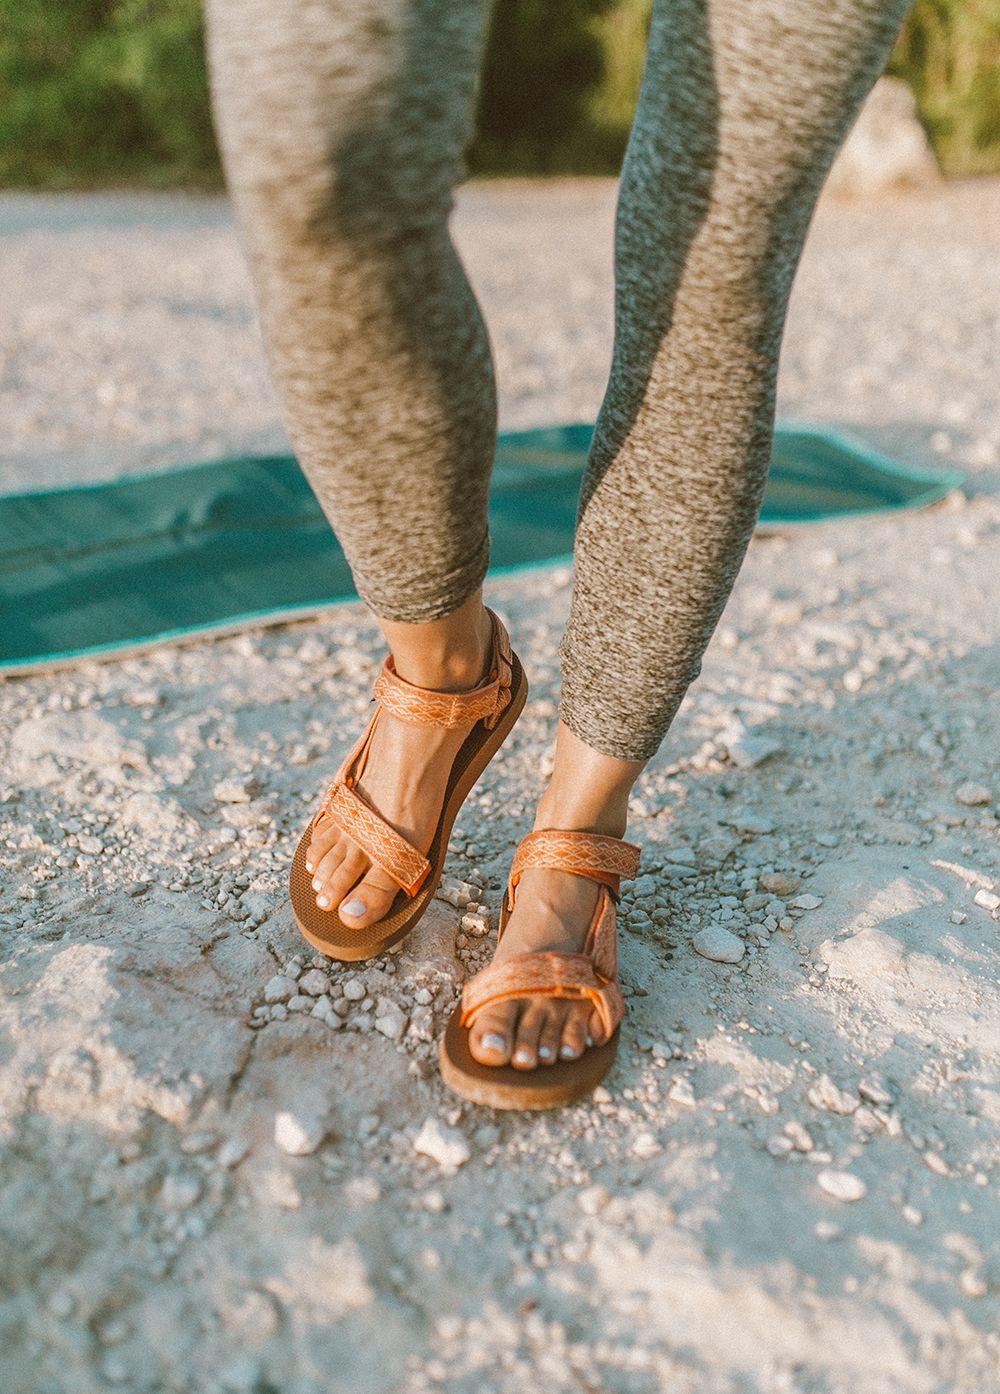 Major Yes To Teva Sandals Livvyland Teva Sandals Teva Sandals Outfit Sandals Outfit Casual